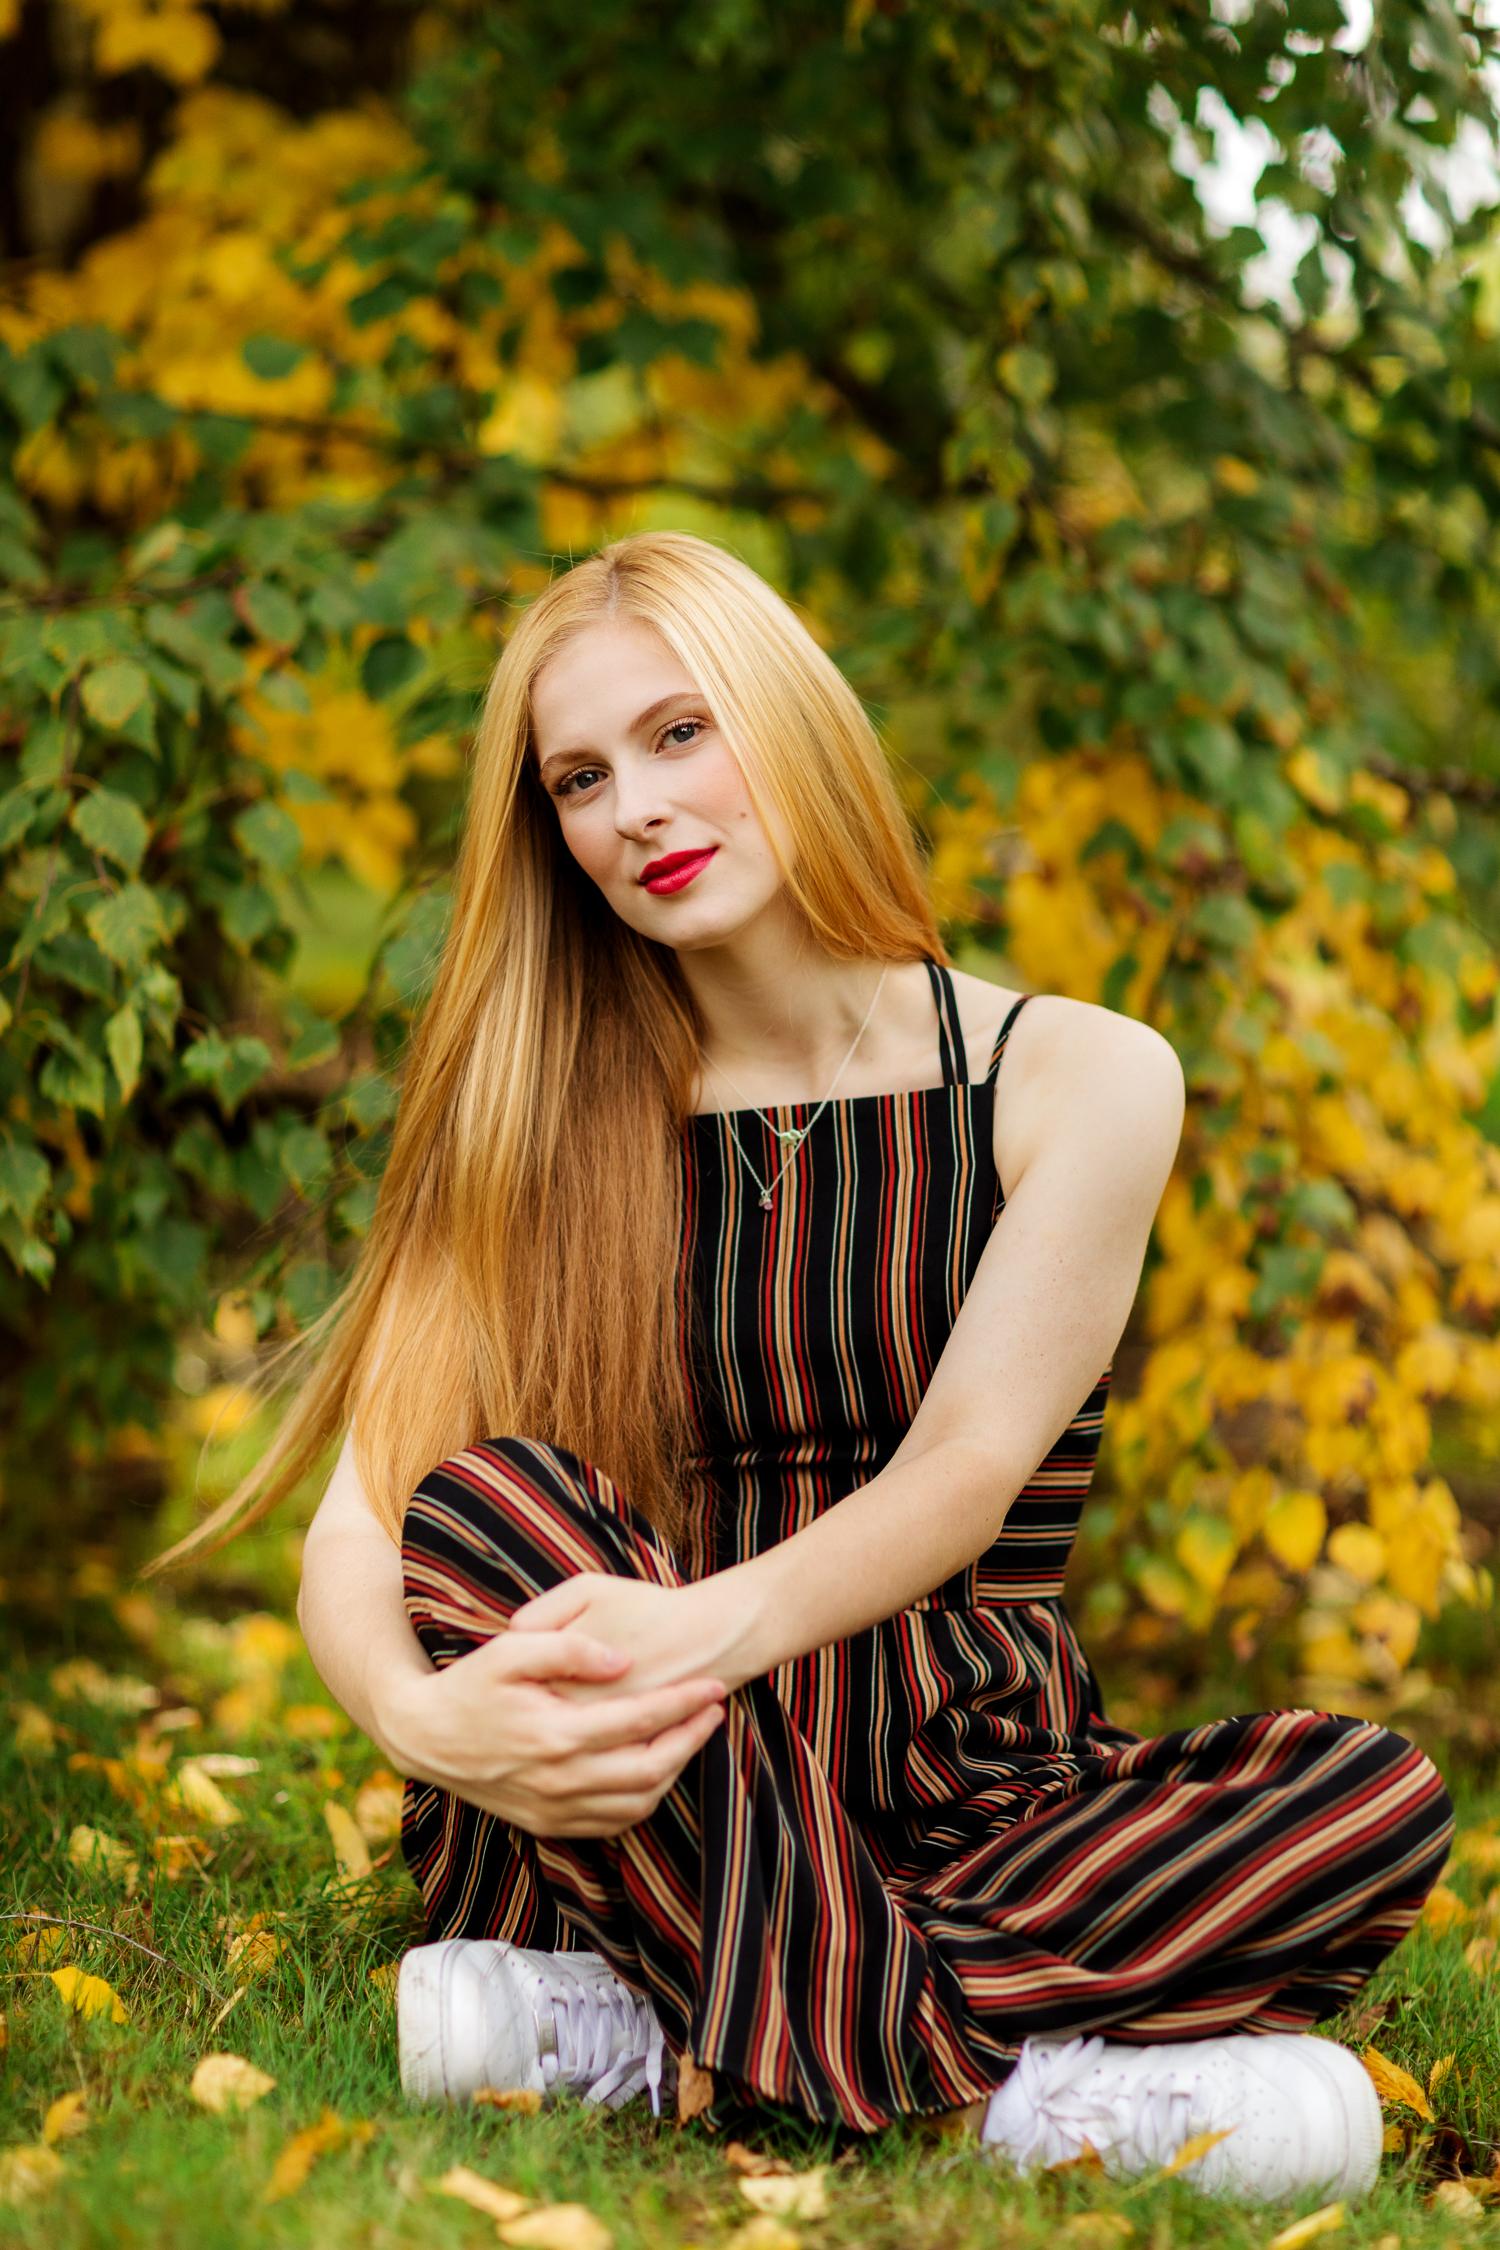 ariella-noelle-photography-seattle-area-senior-portraits-redmond-high-school-newport-bellevue-6.jpg